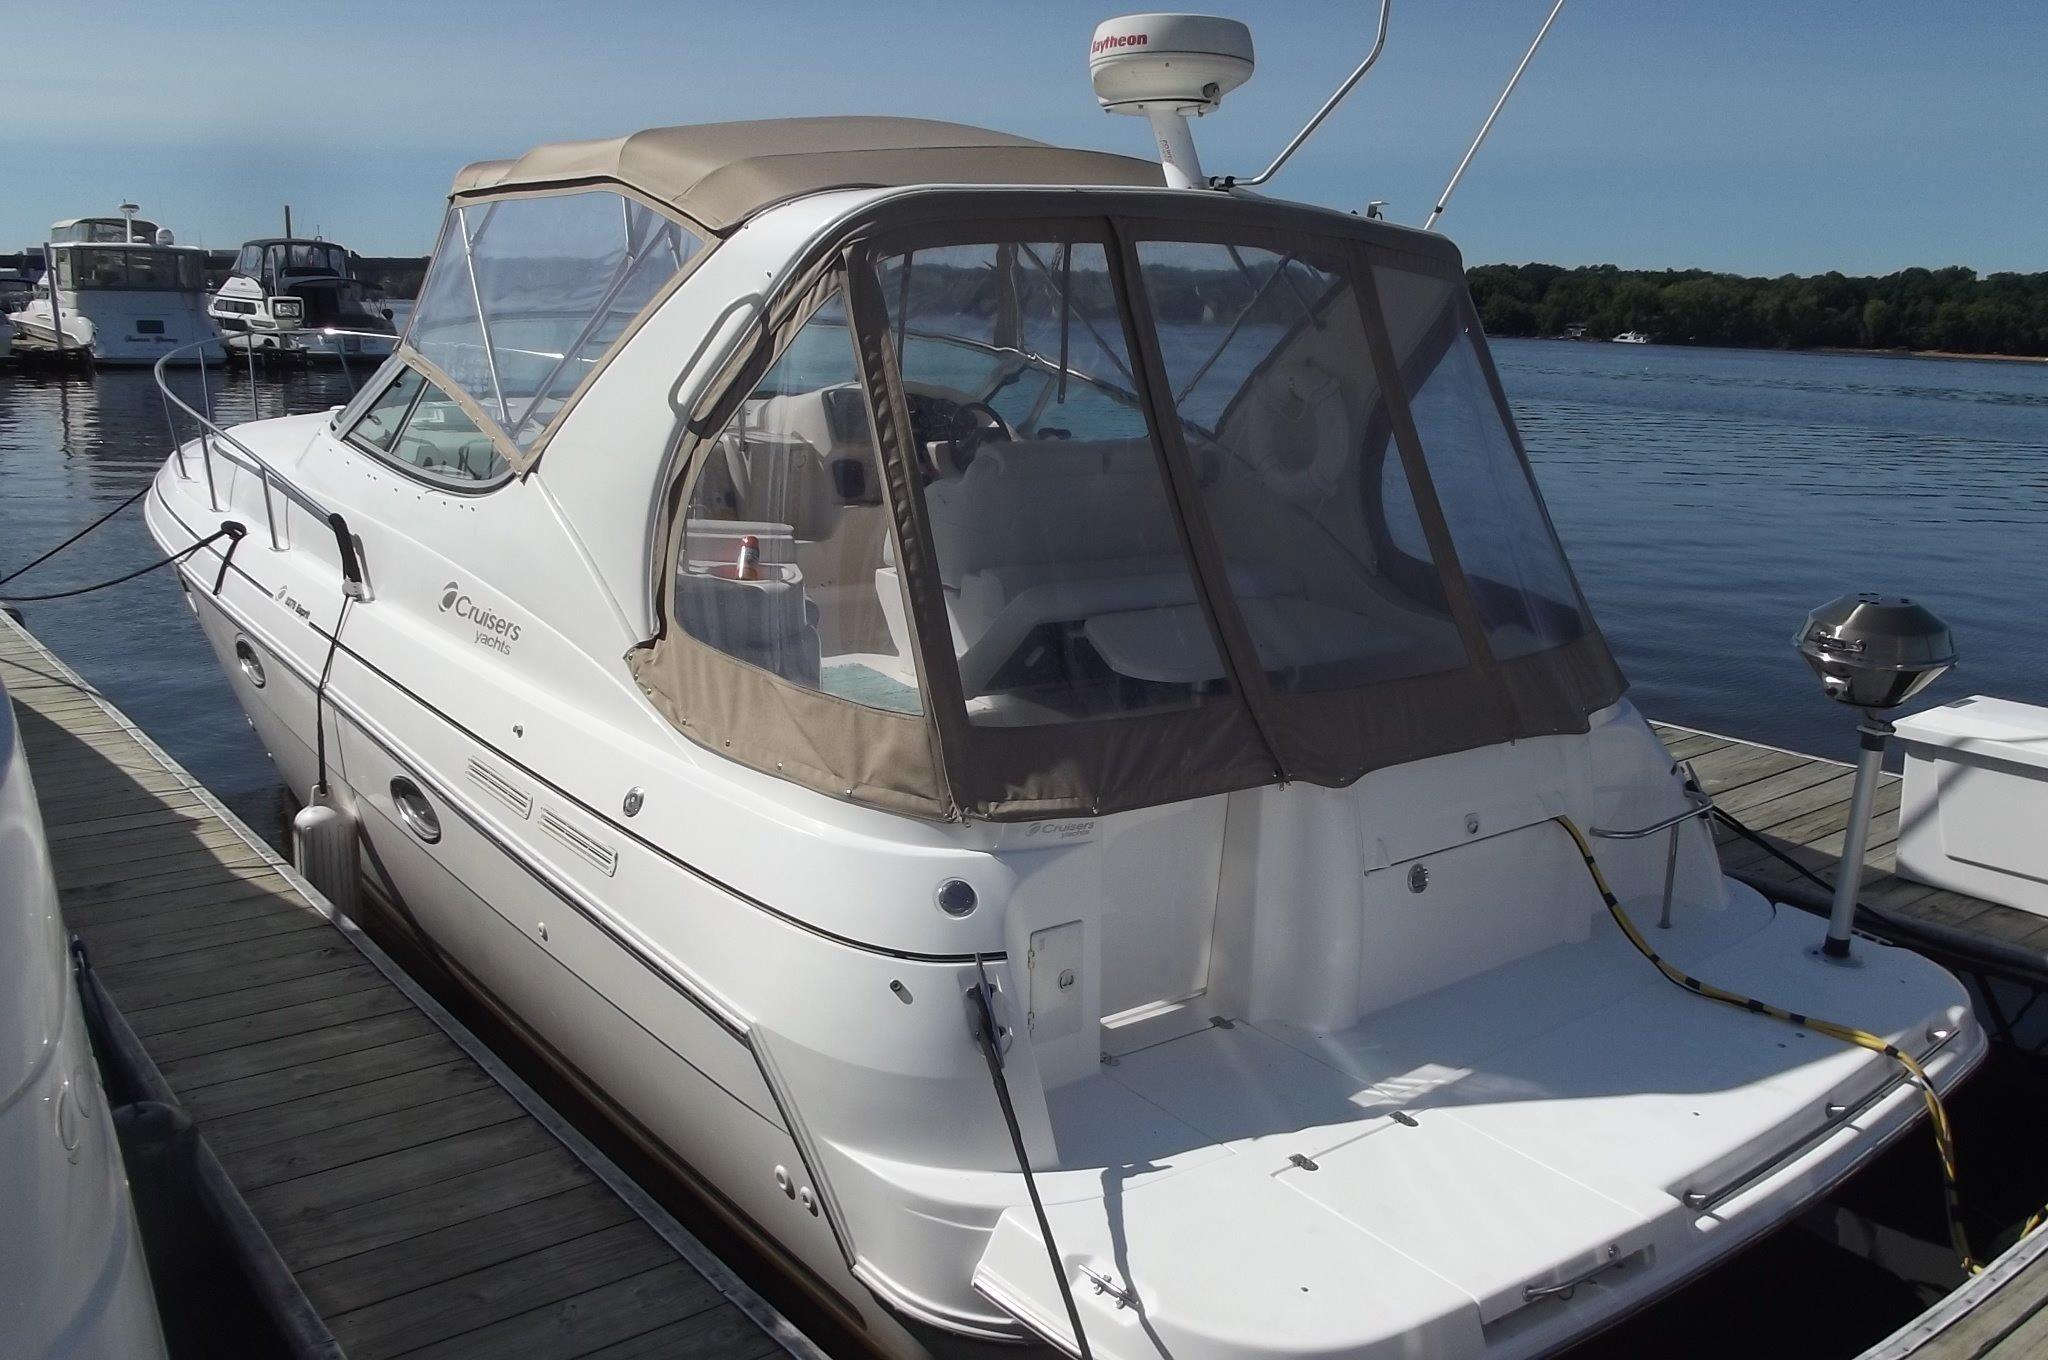 cruisers tourboat feadship cruiser boat cabin devea dsc cabins classic vehicle service